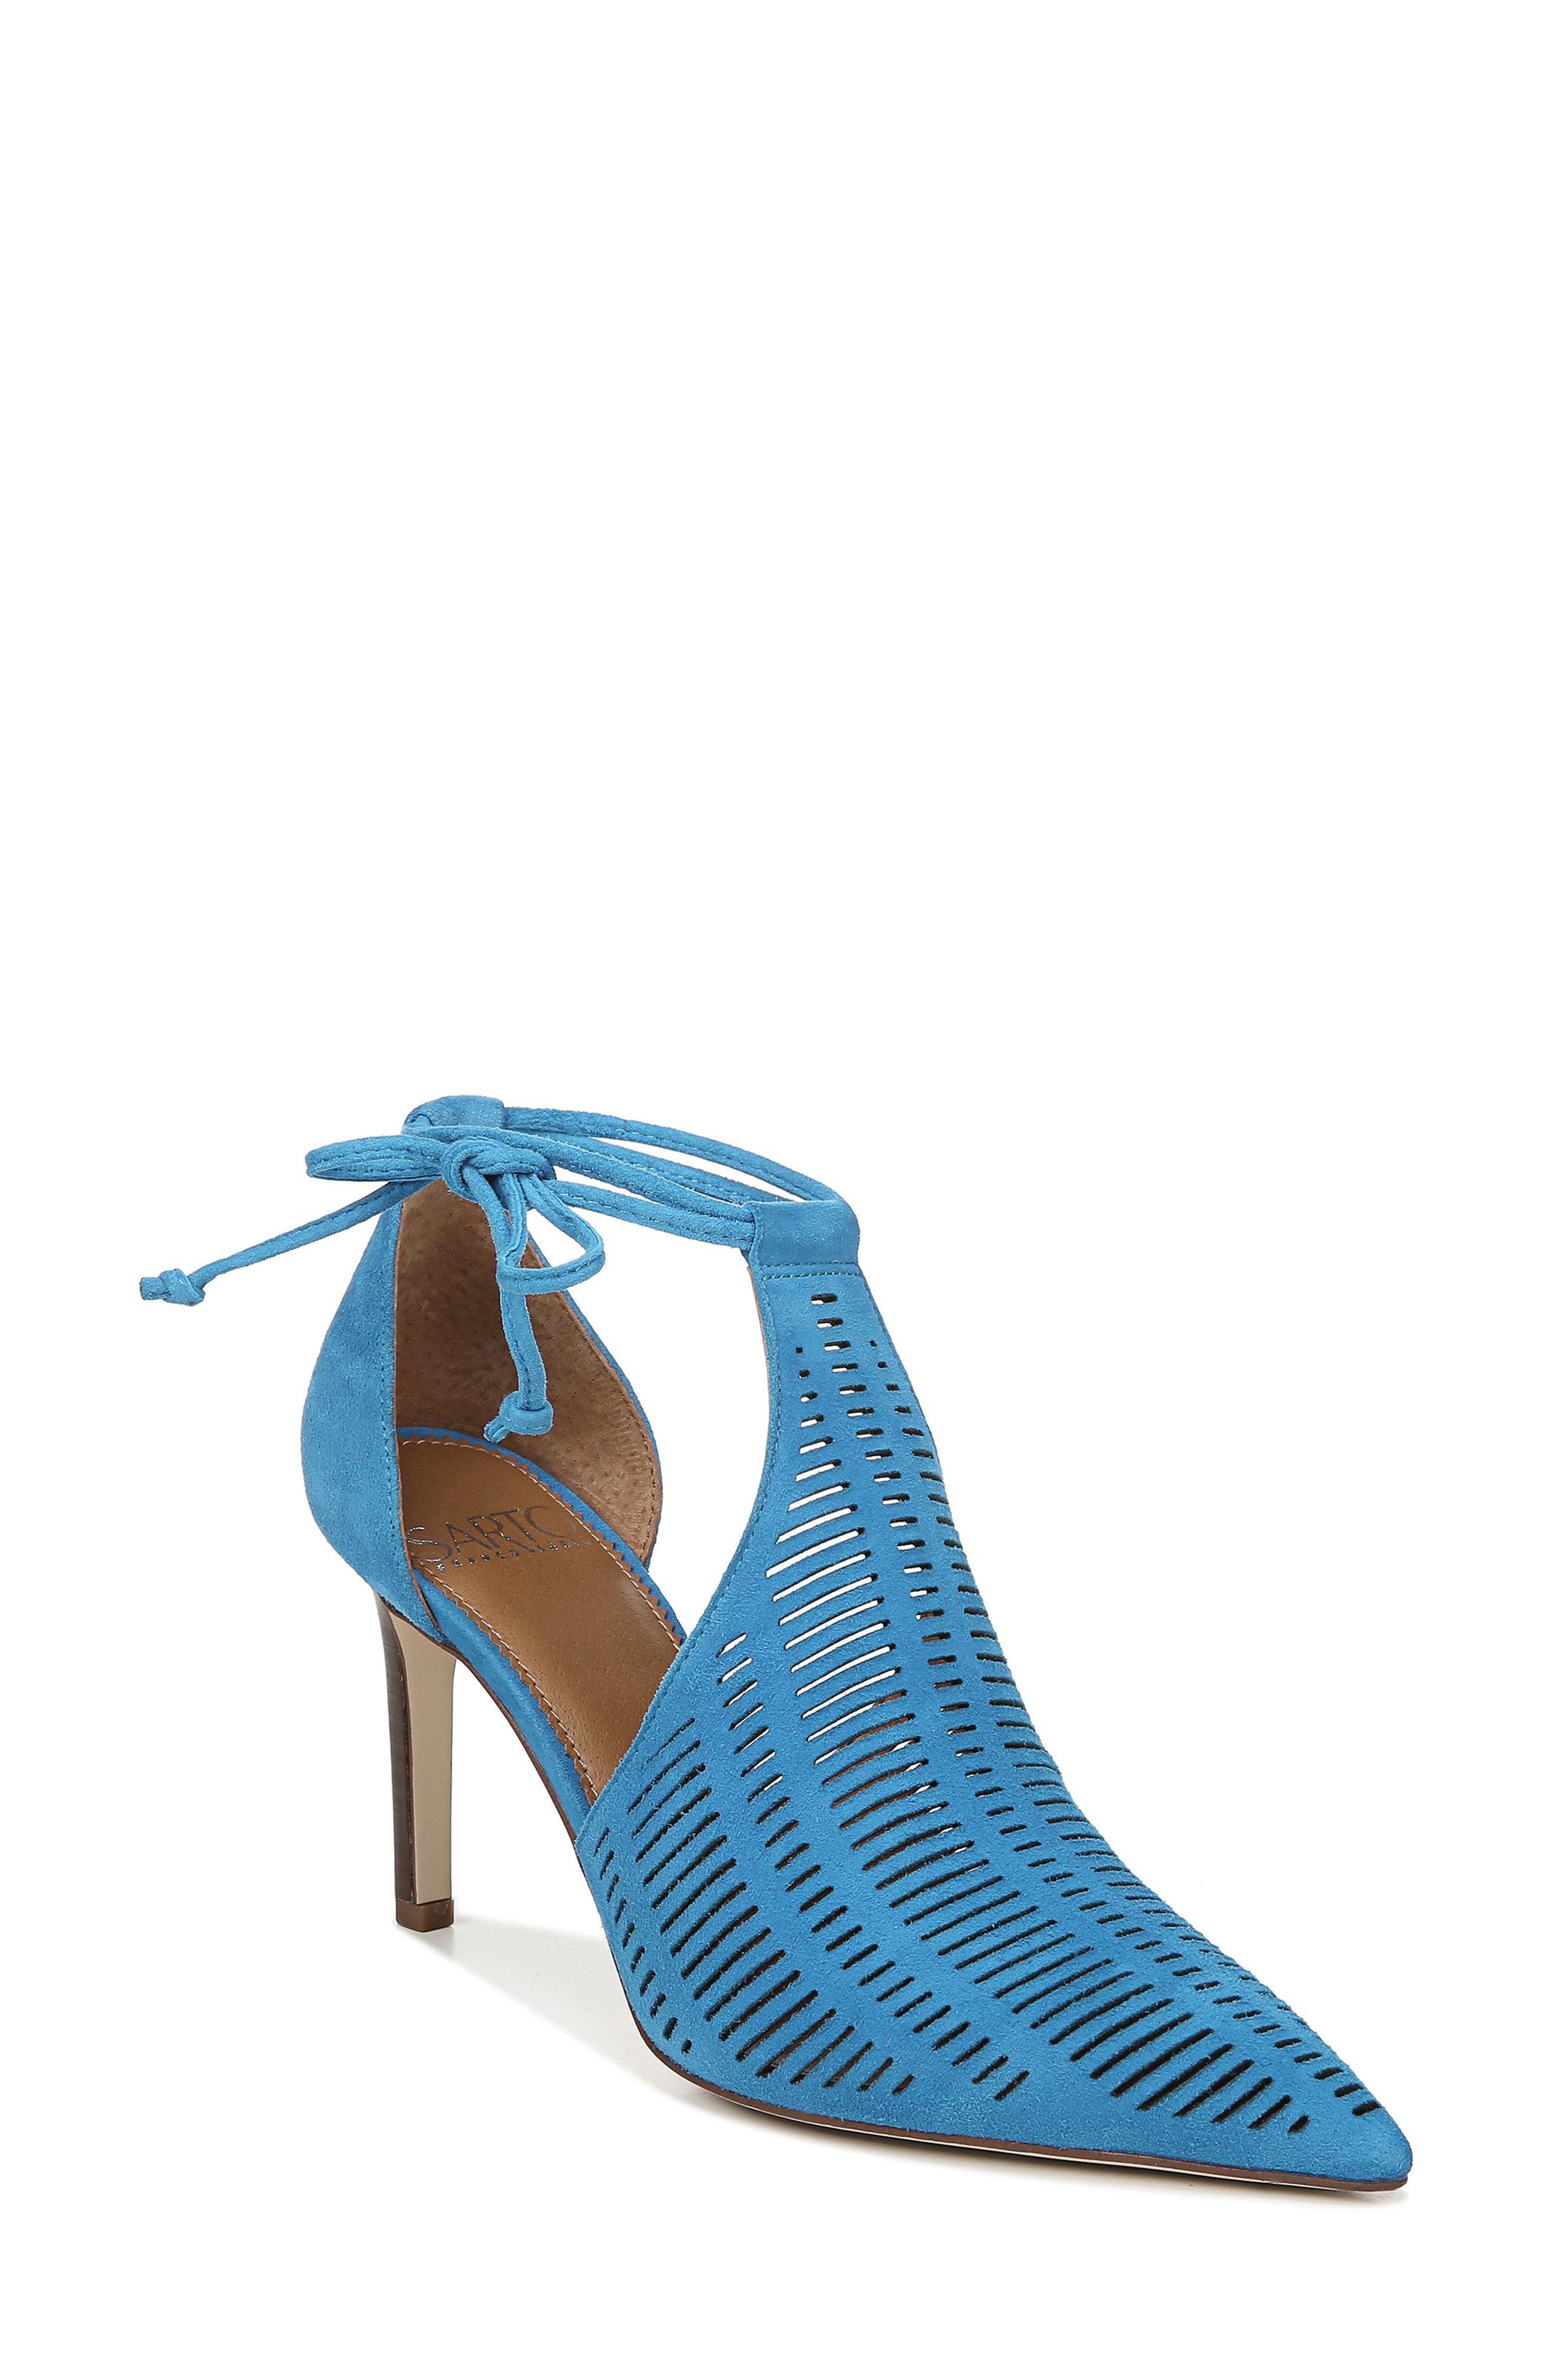 Sarto By Franco Sarto Krista Perforated Ankle Wrap Pump- Blue